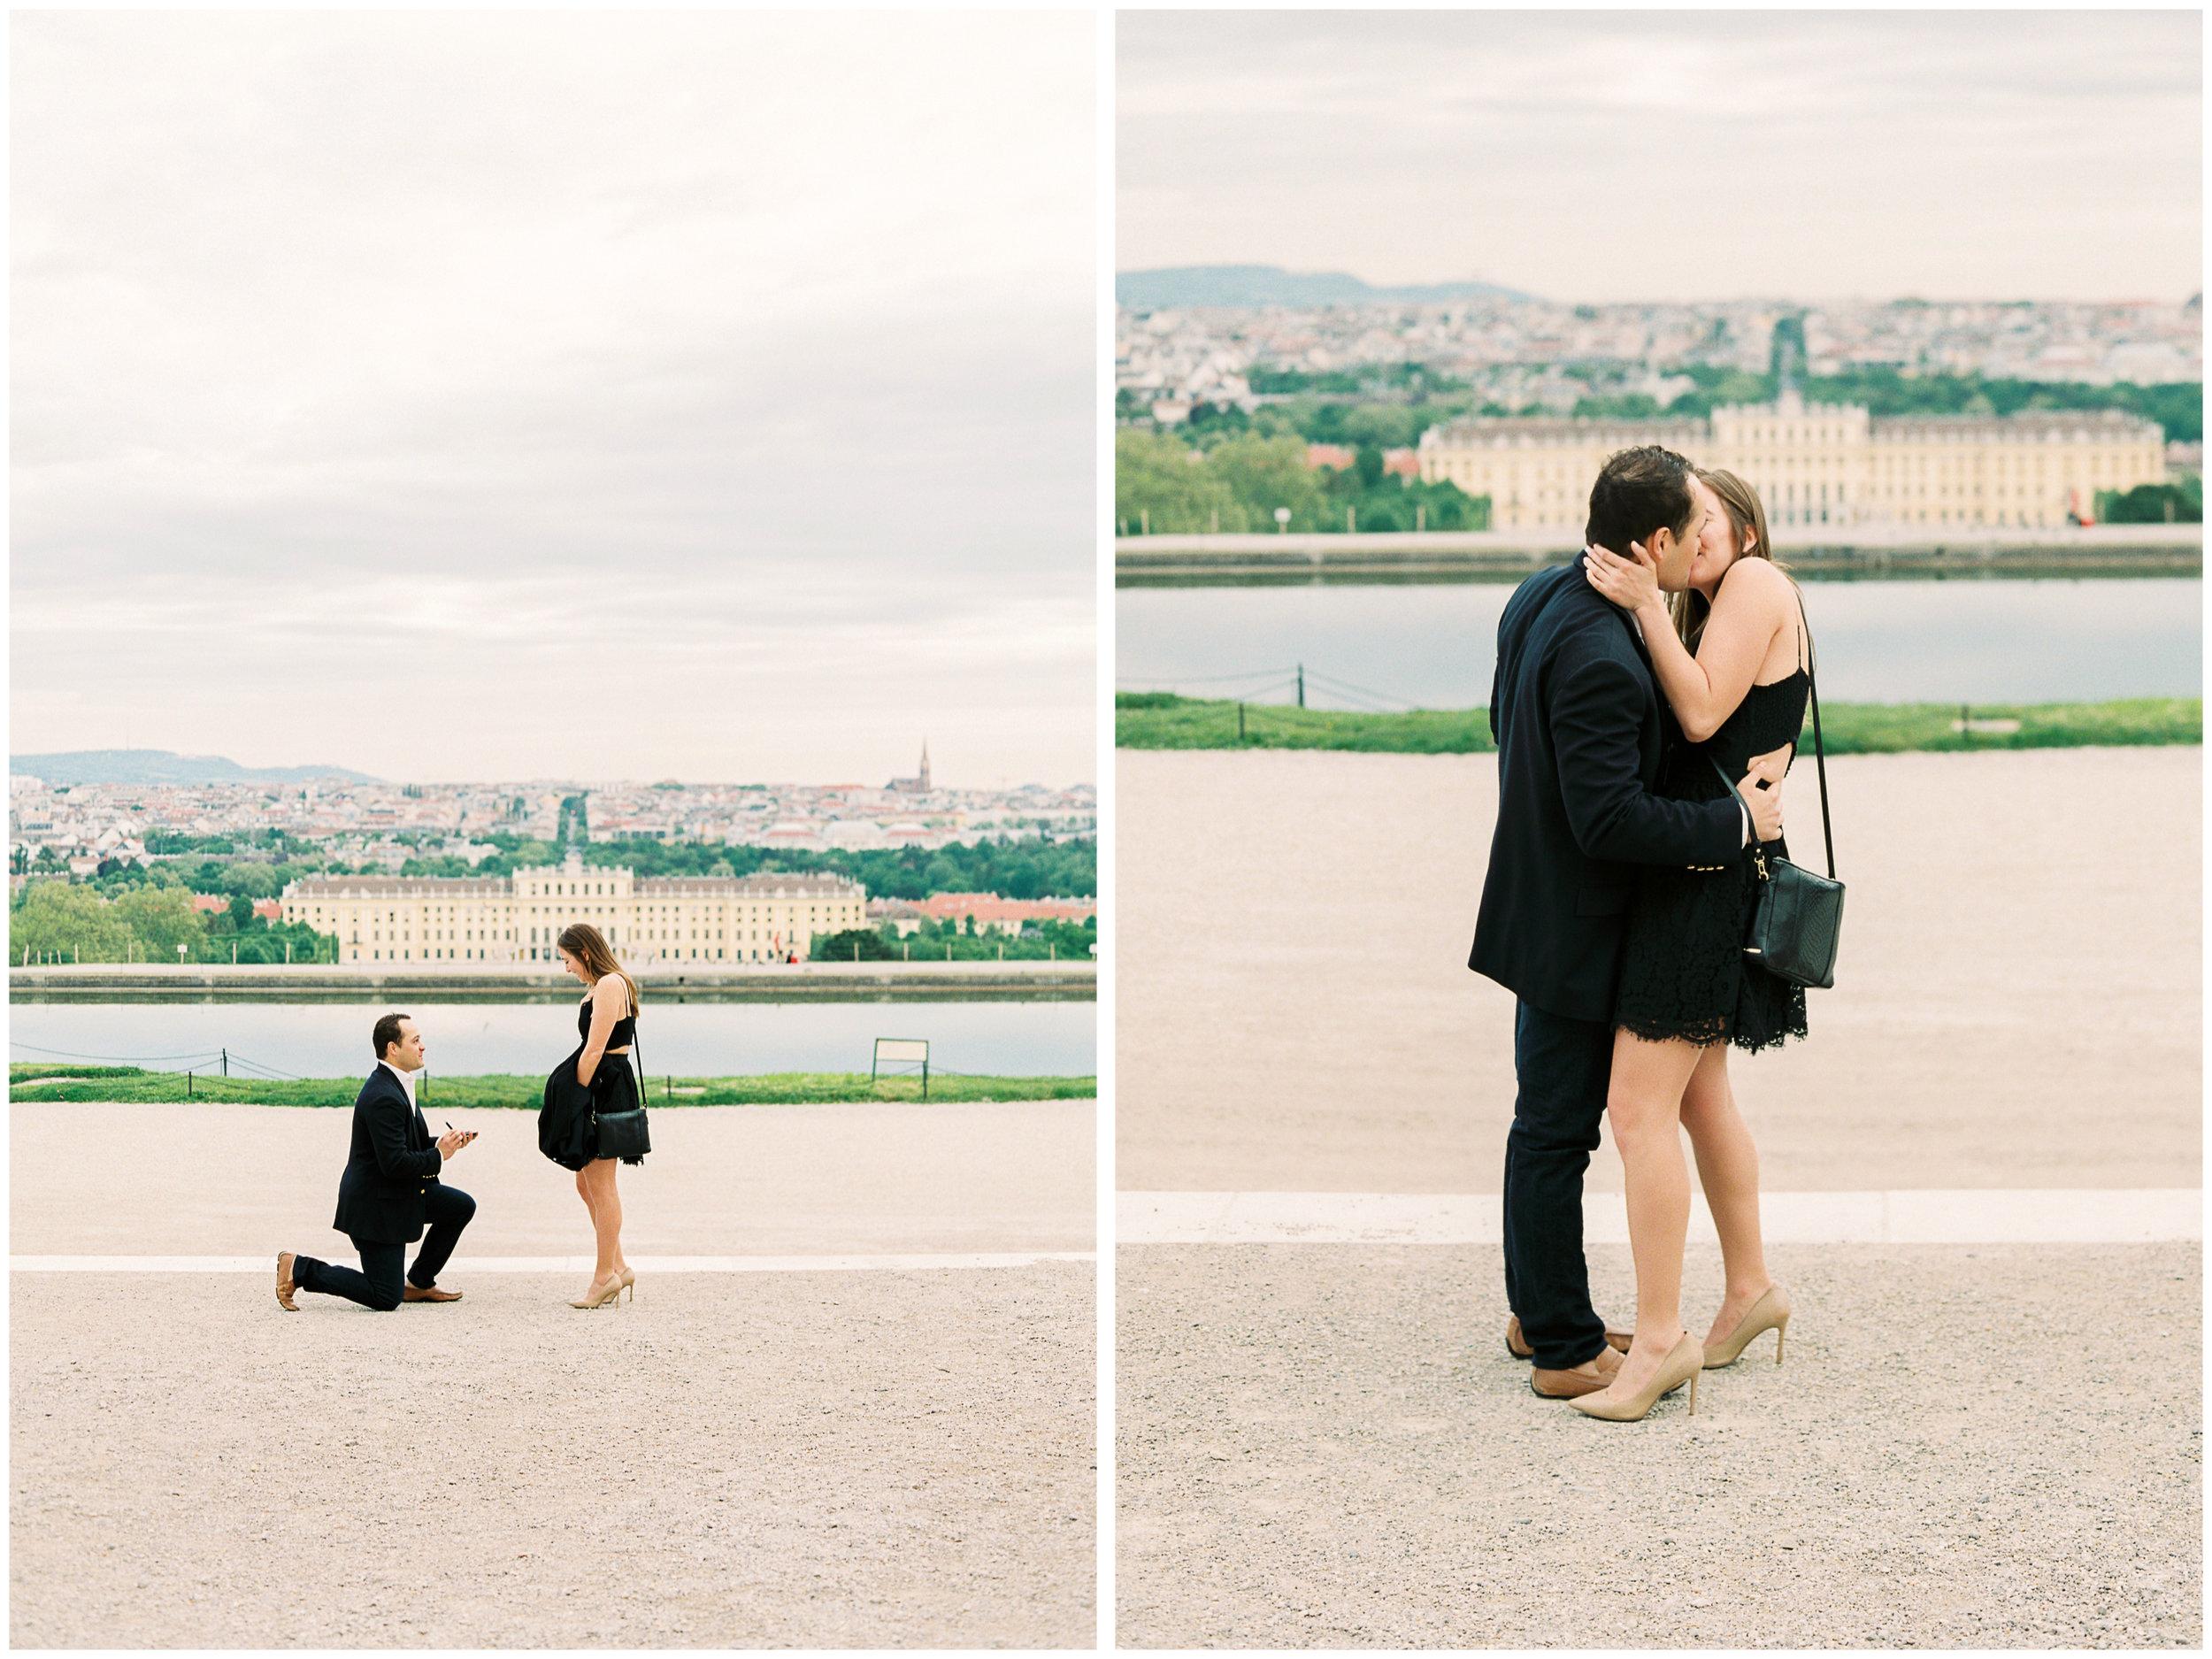 Surprise Proposal | The Gloriette, Vienna | Michelle Mock Photography | Vienna Photographer | Contax 645 | Fuji400H